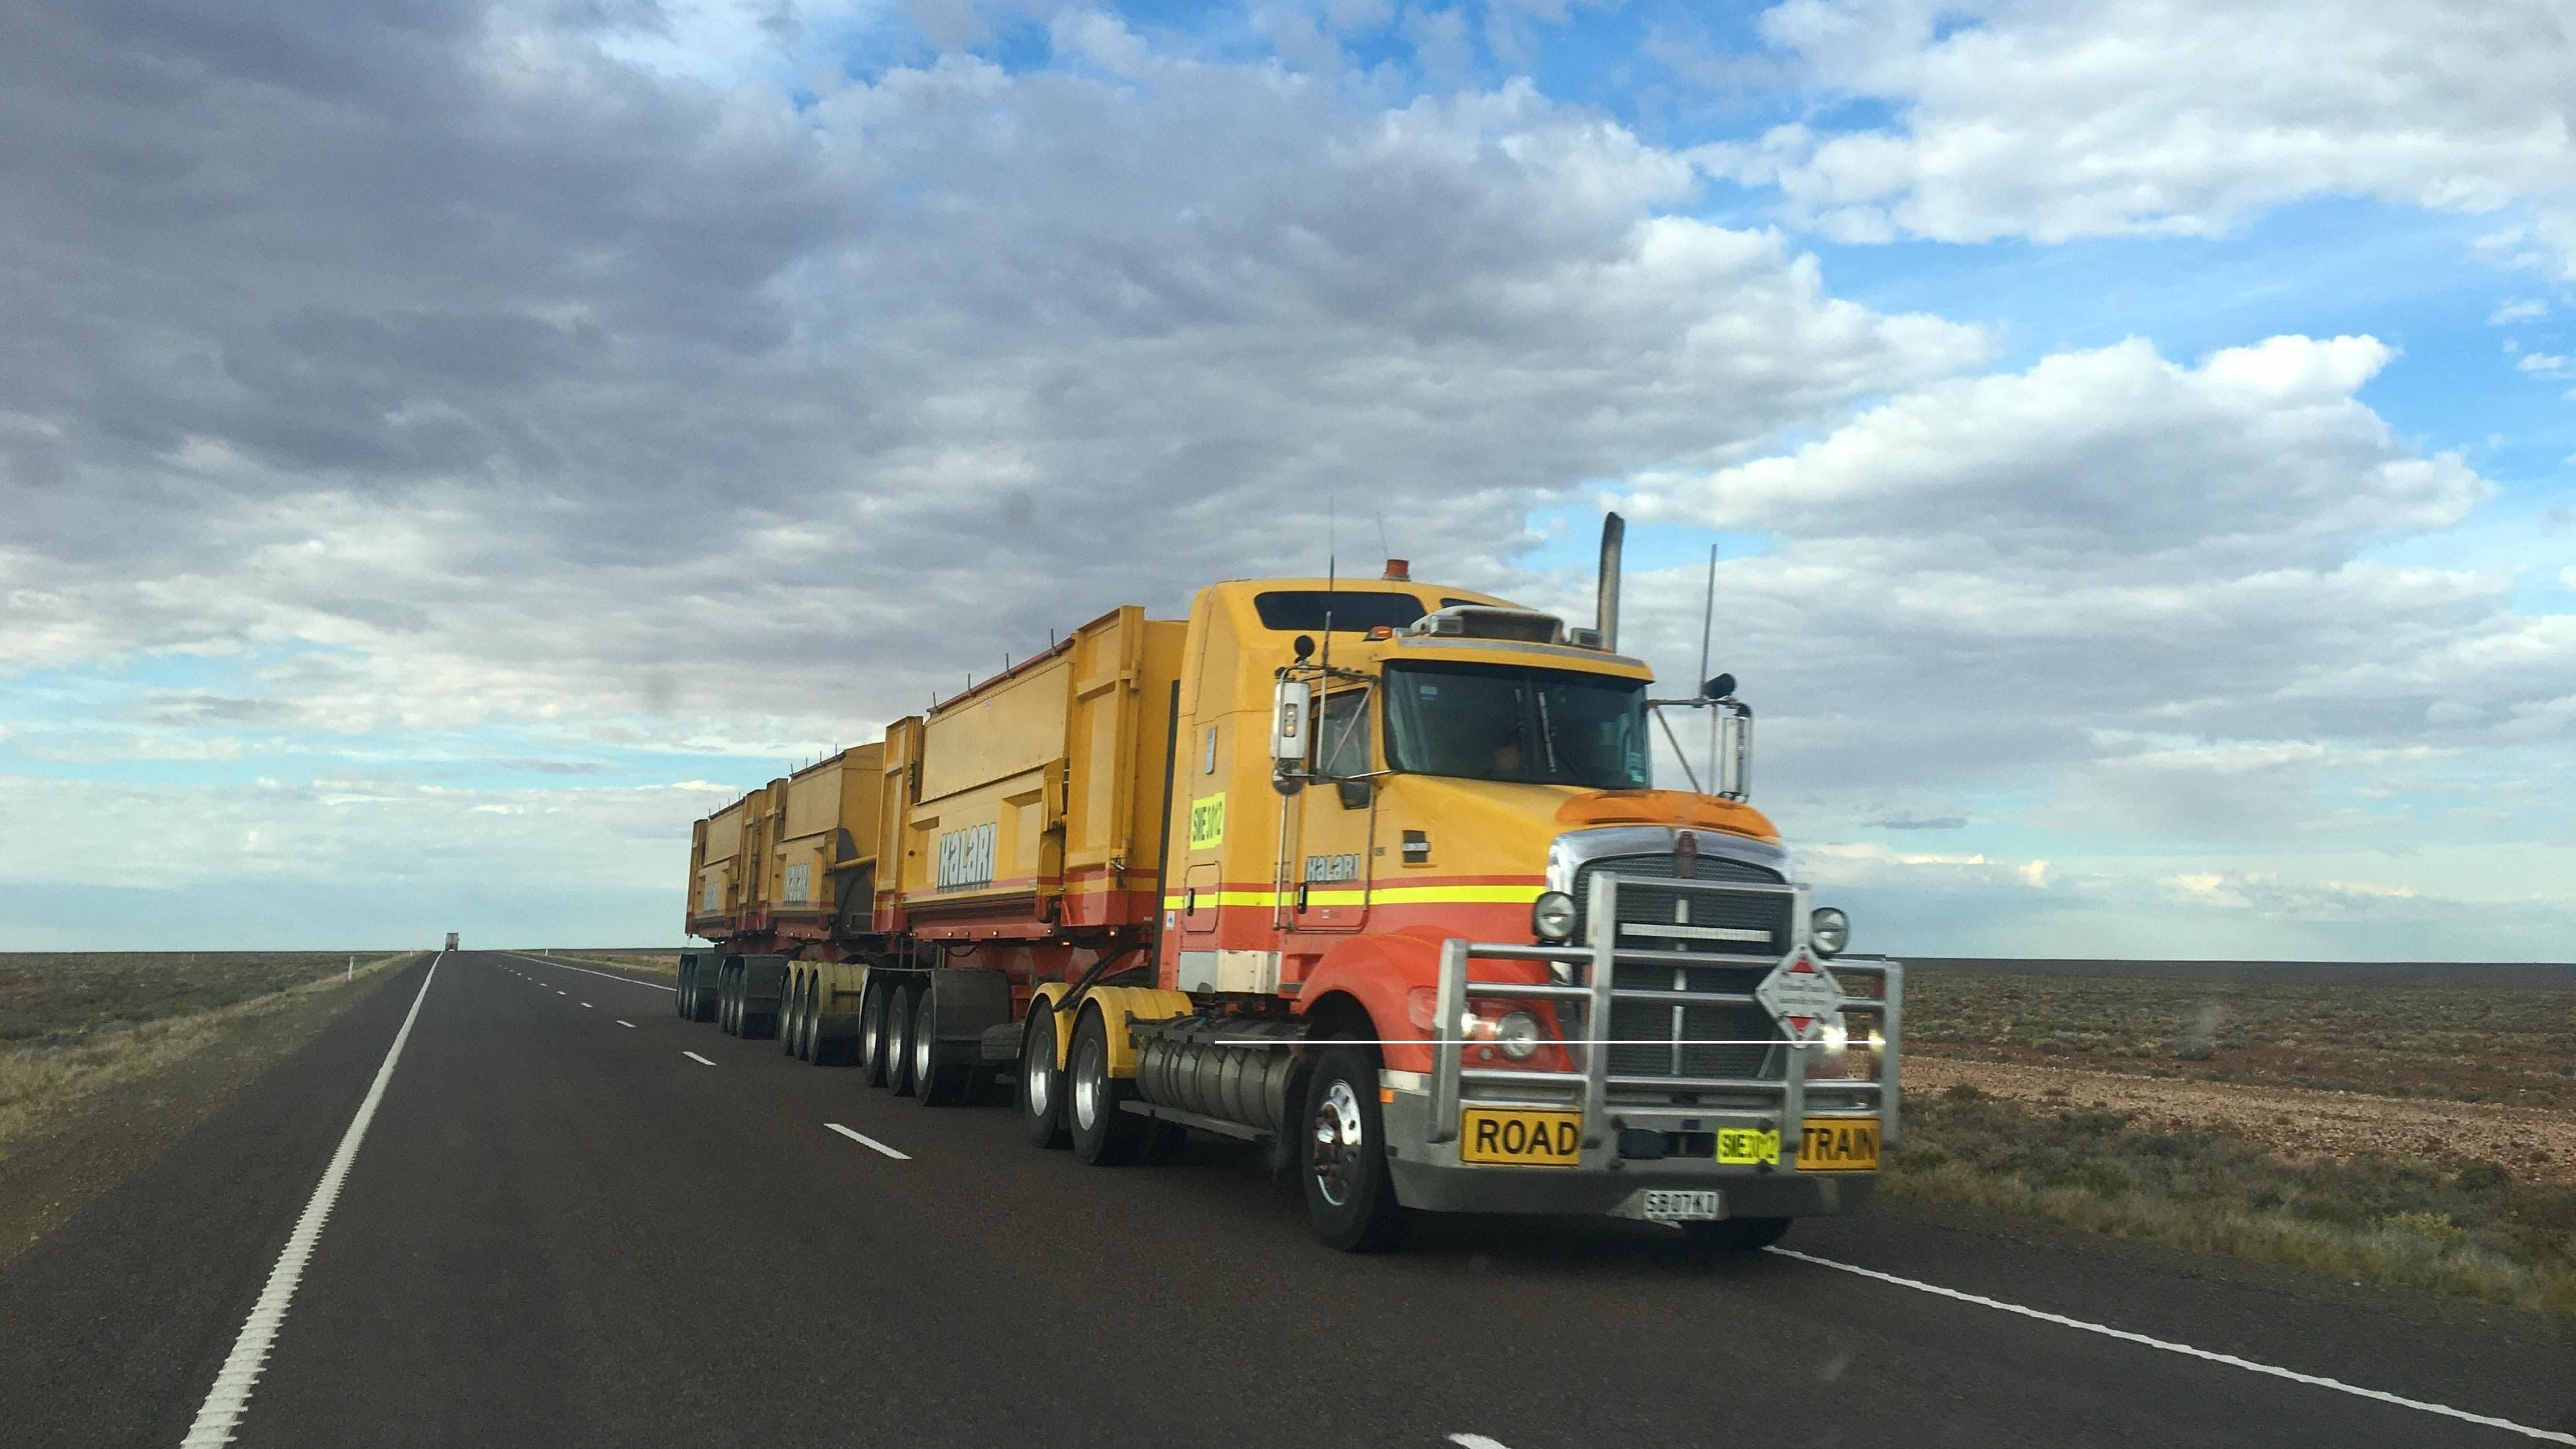 Road Truck Photo